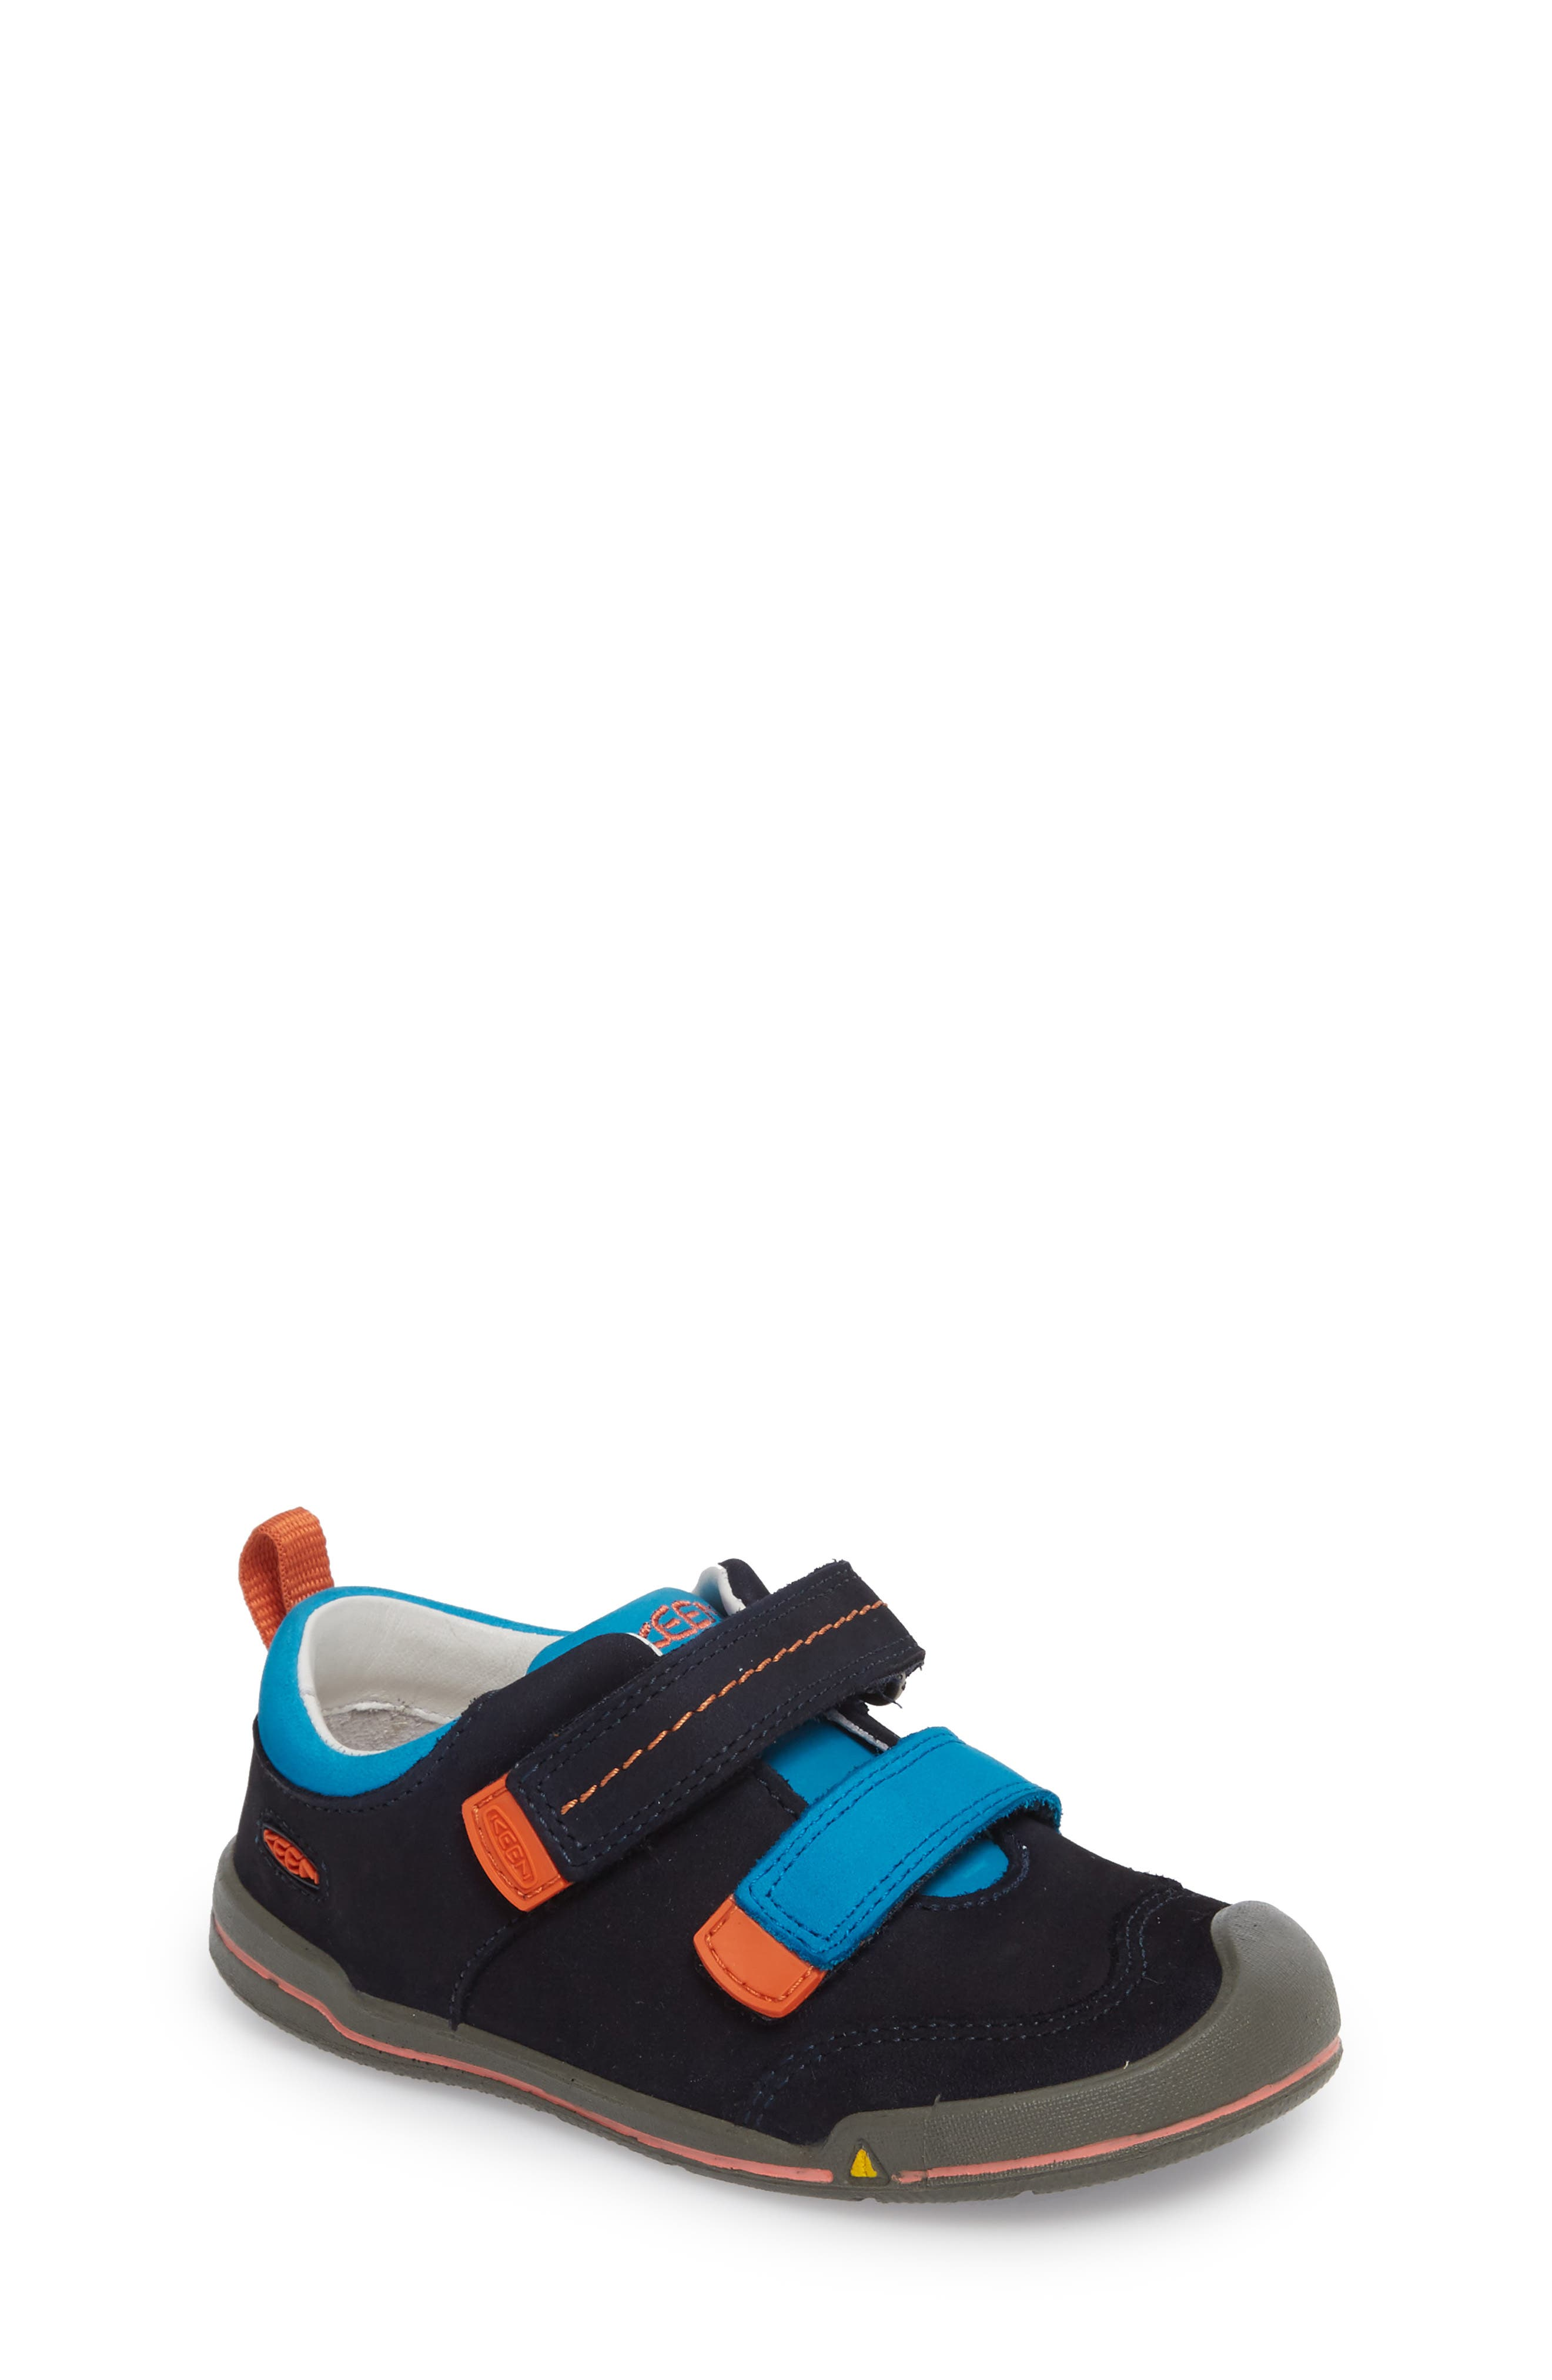 Sprout Double Strap Sneaker,                             Main thumbnail 1, color,                             DRESS BLUES/ KOI